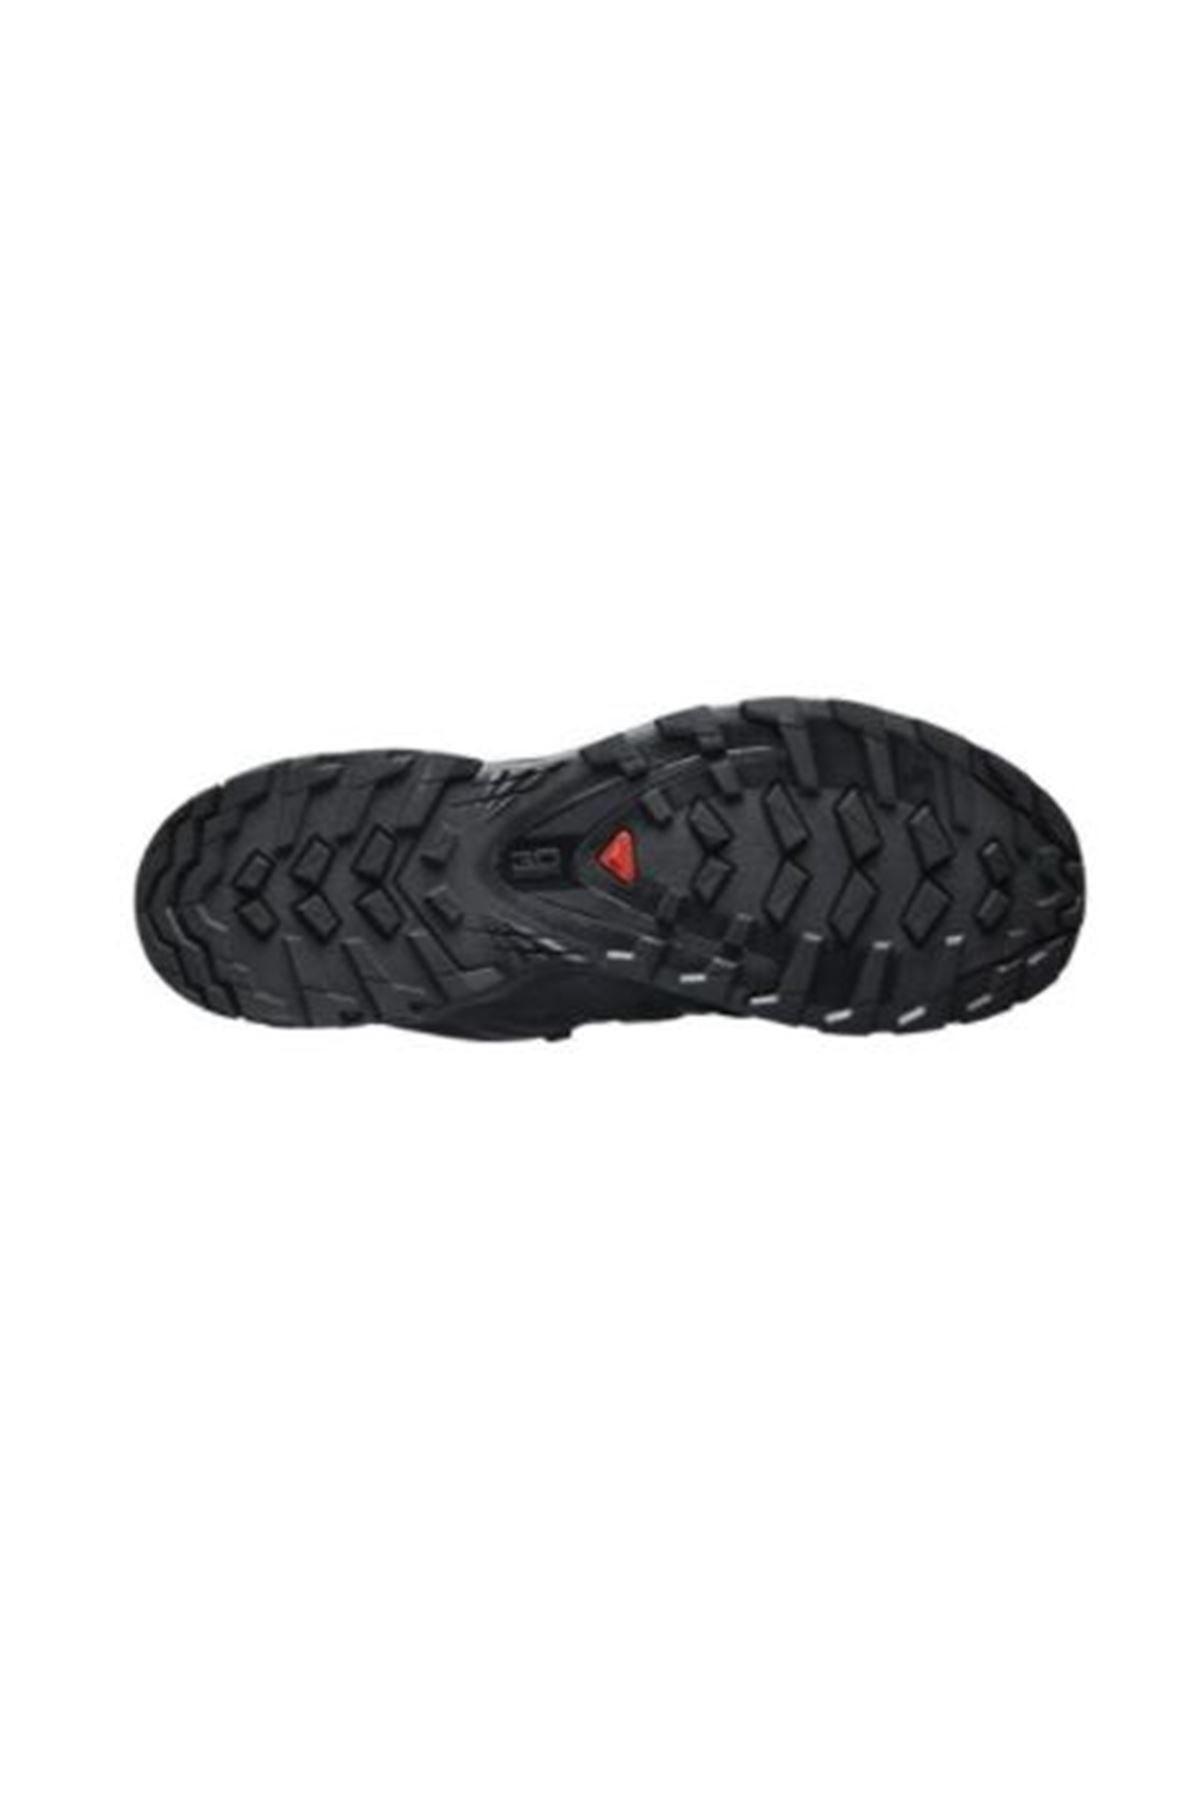 Salomon Xa Pro 3d V8 Gtx Bayan Outdoor Ayakkabı 411182 2